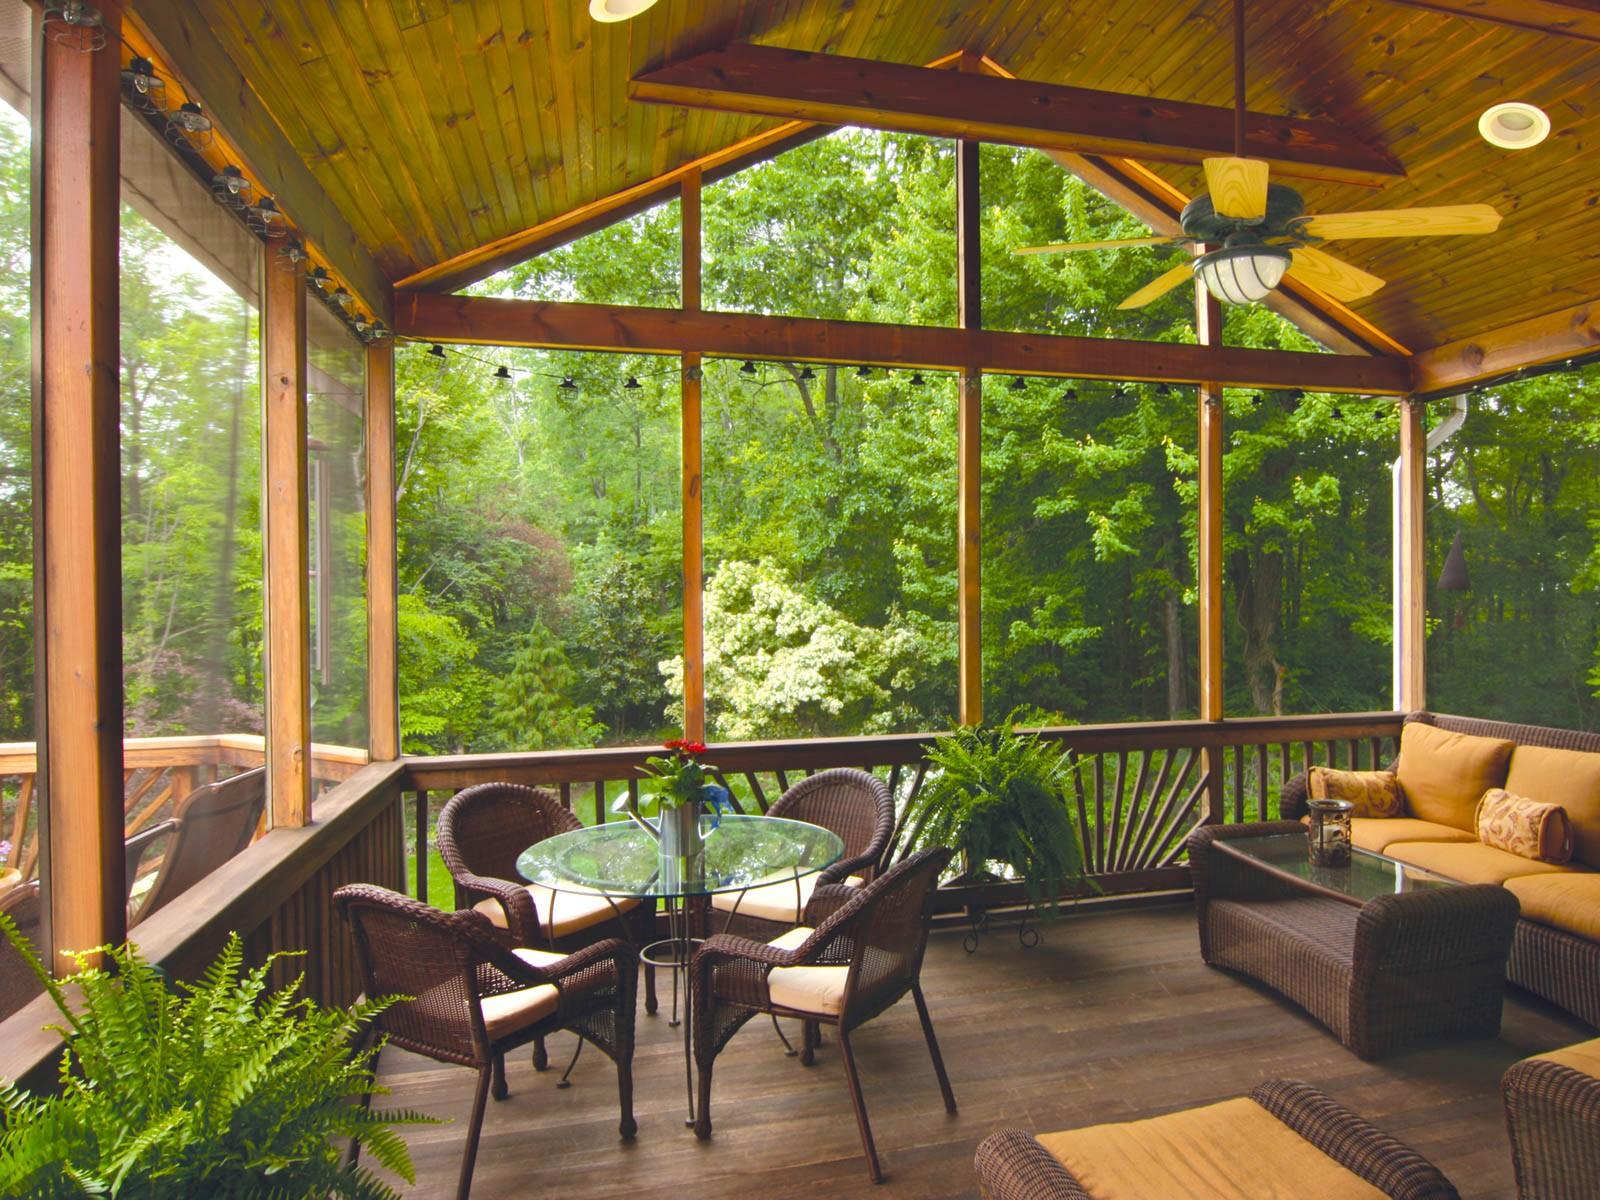 Screened-in wood porch, Hardscape, landscape design